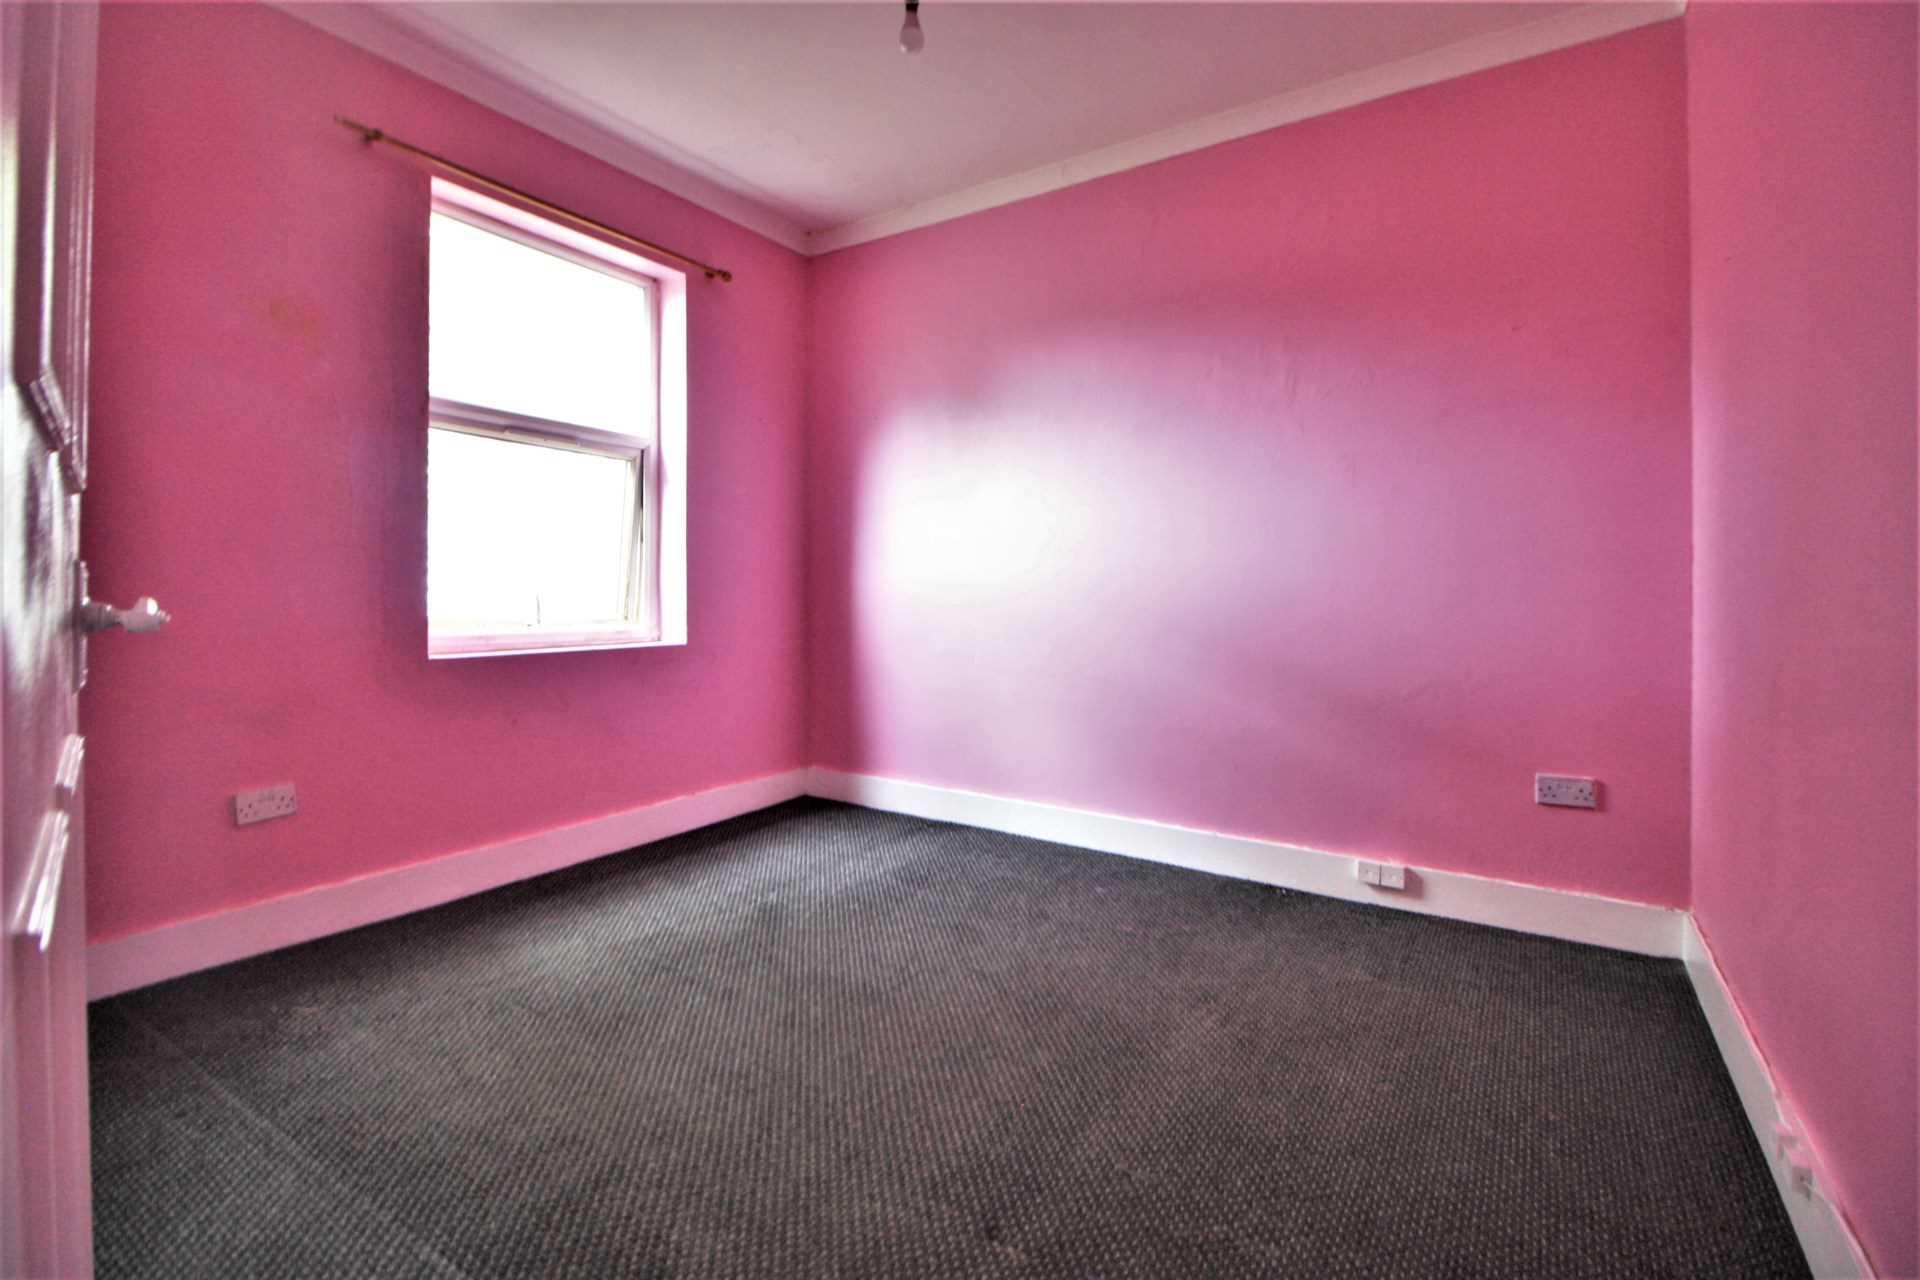 Cann Hall Road, London, E17, Image 4